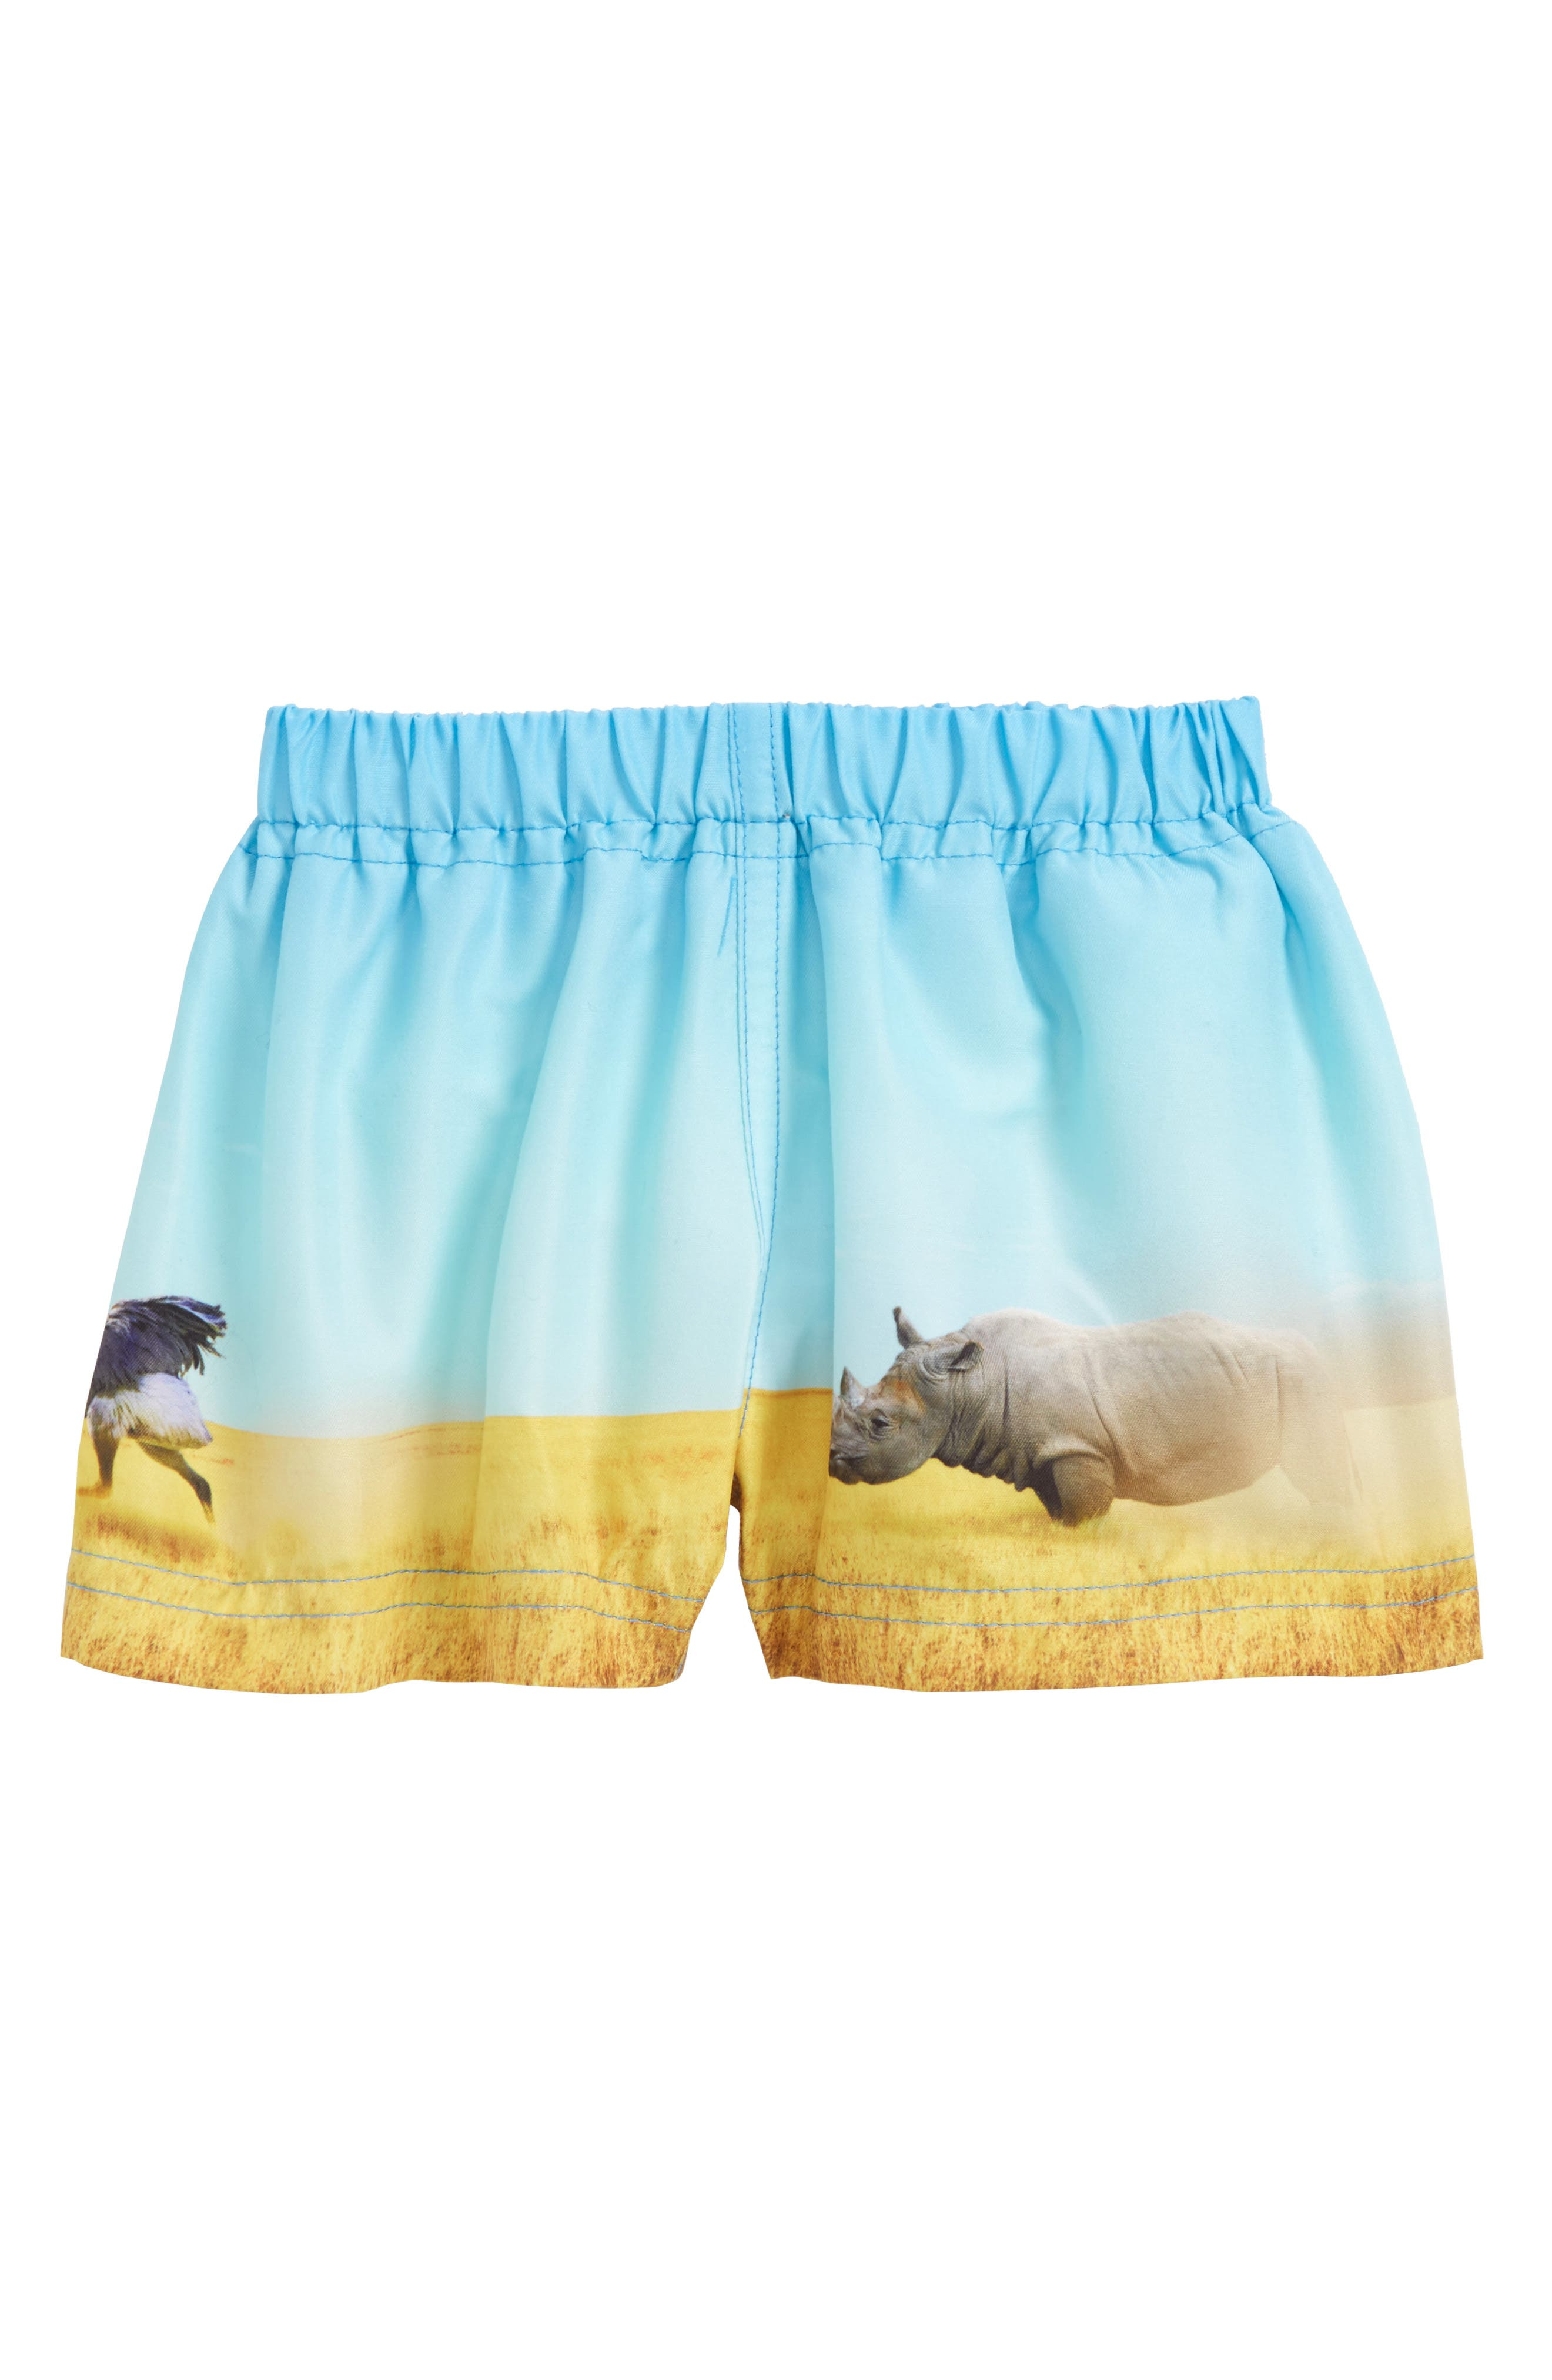 Newton Swim Trunks,                         Main,                         color, Rhino